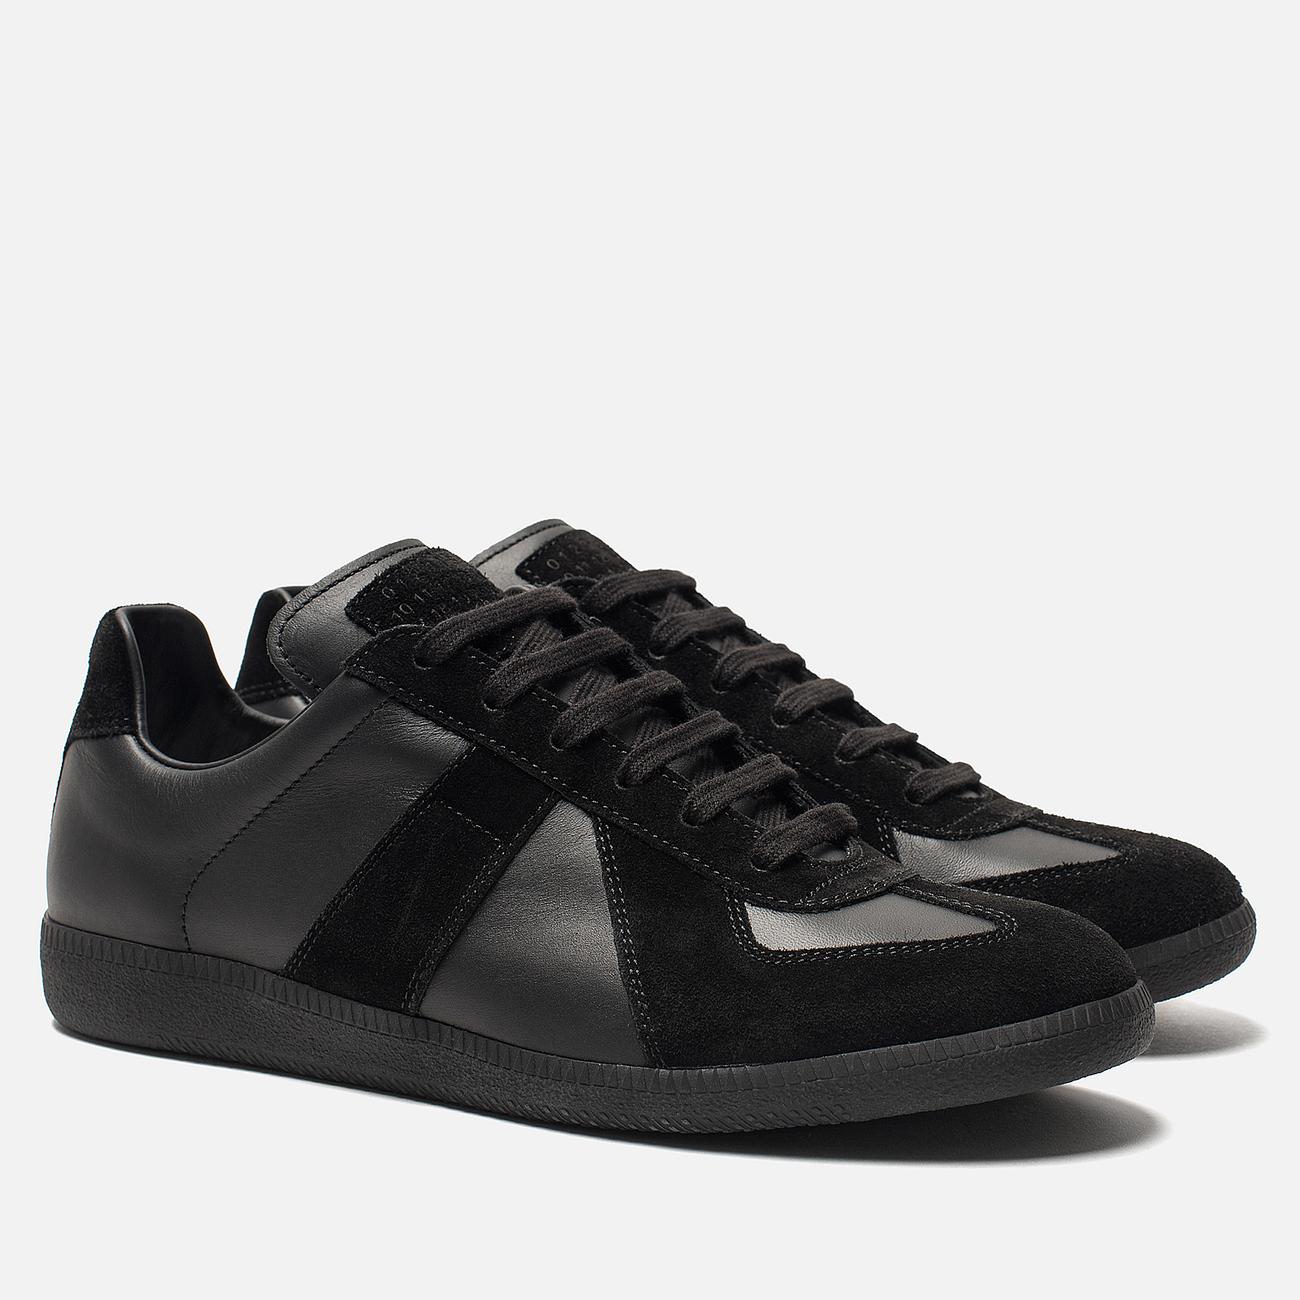 Мужские кроссовки Maison Margiela Replica Low Top Black